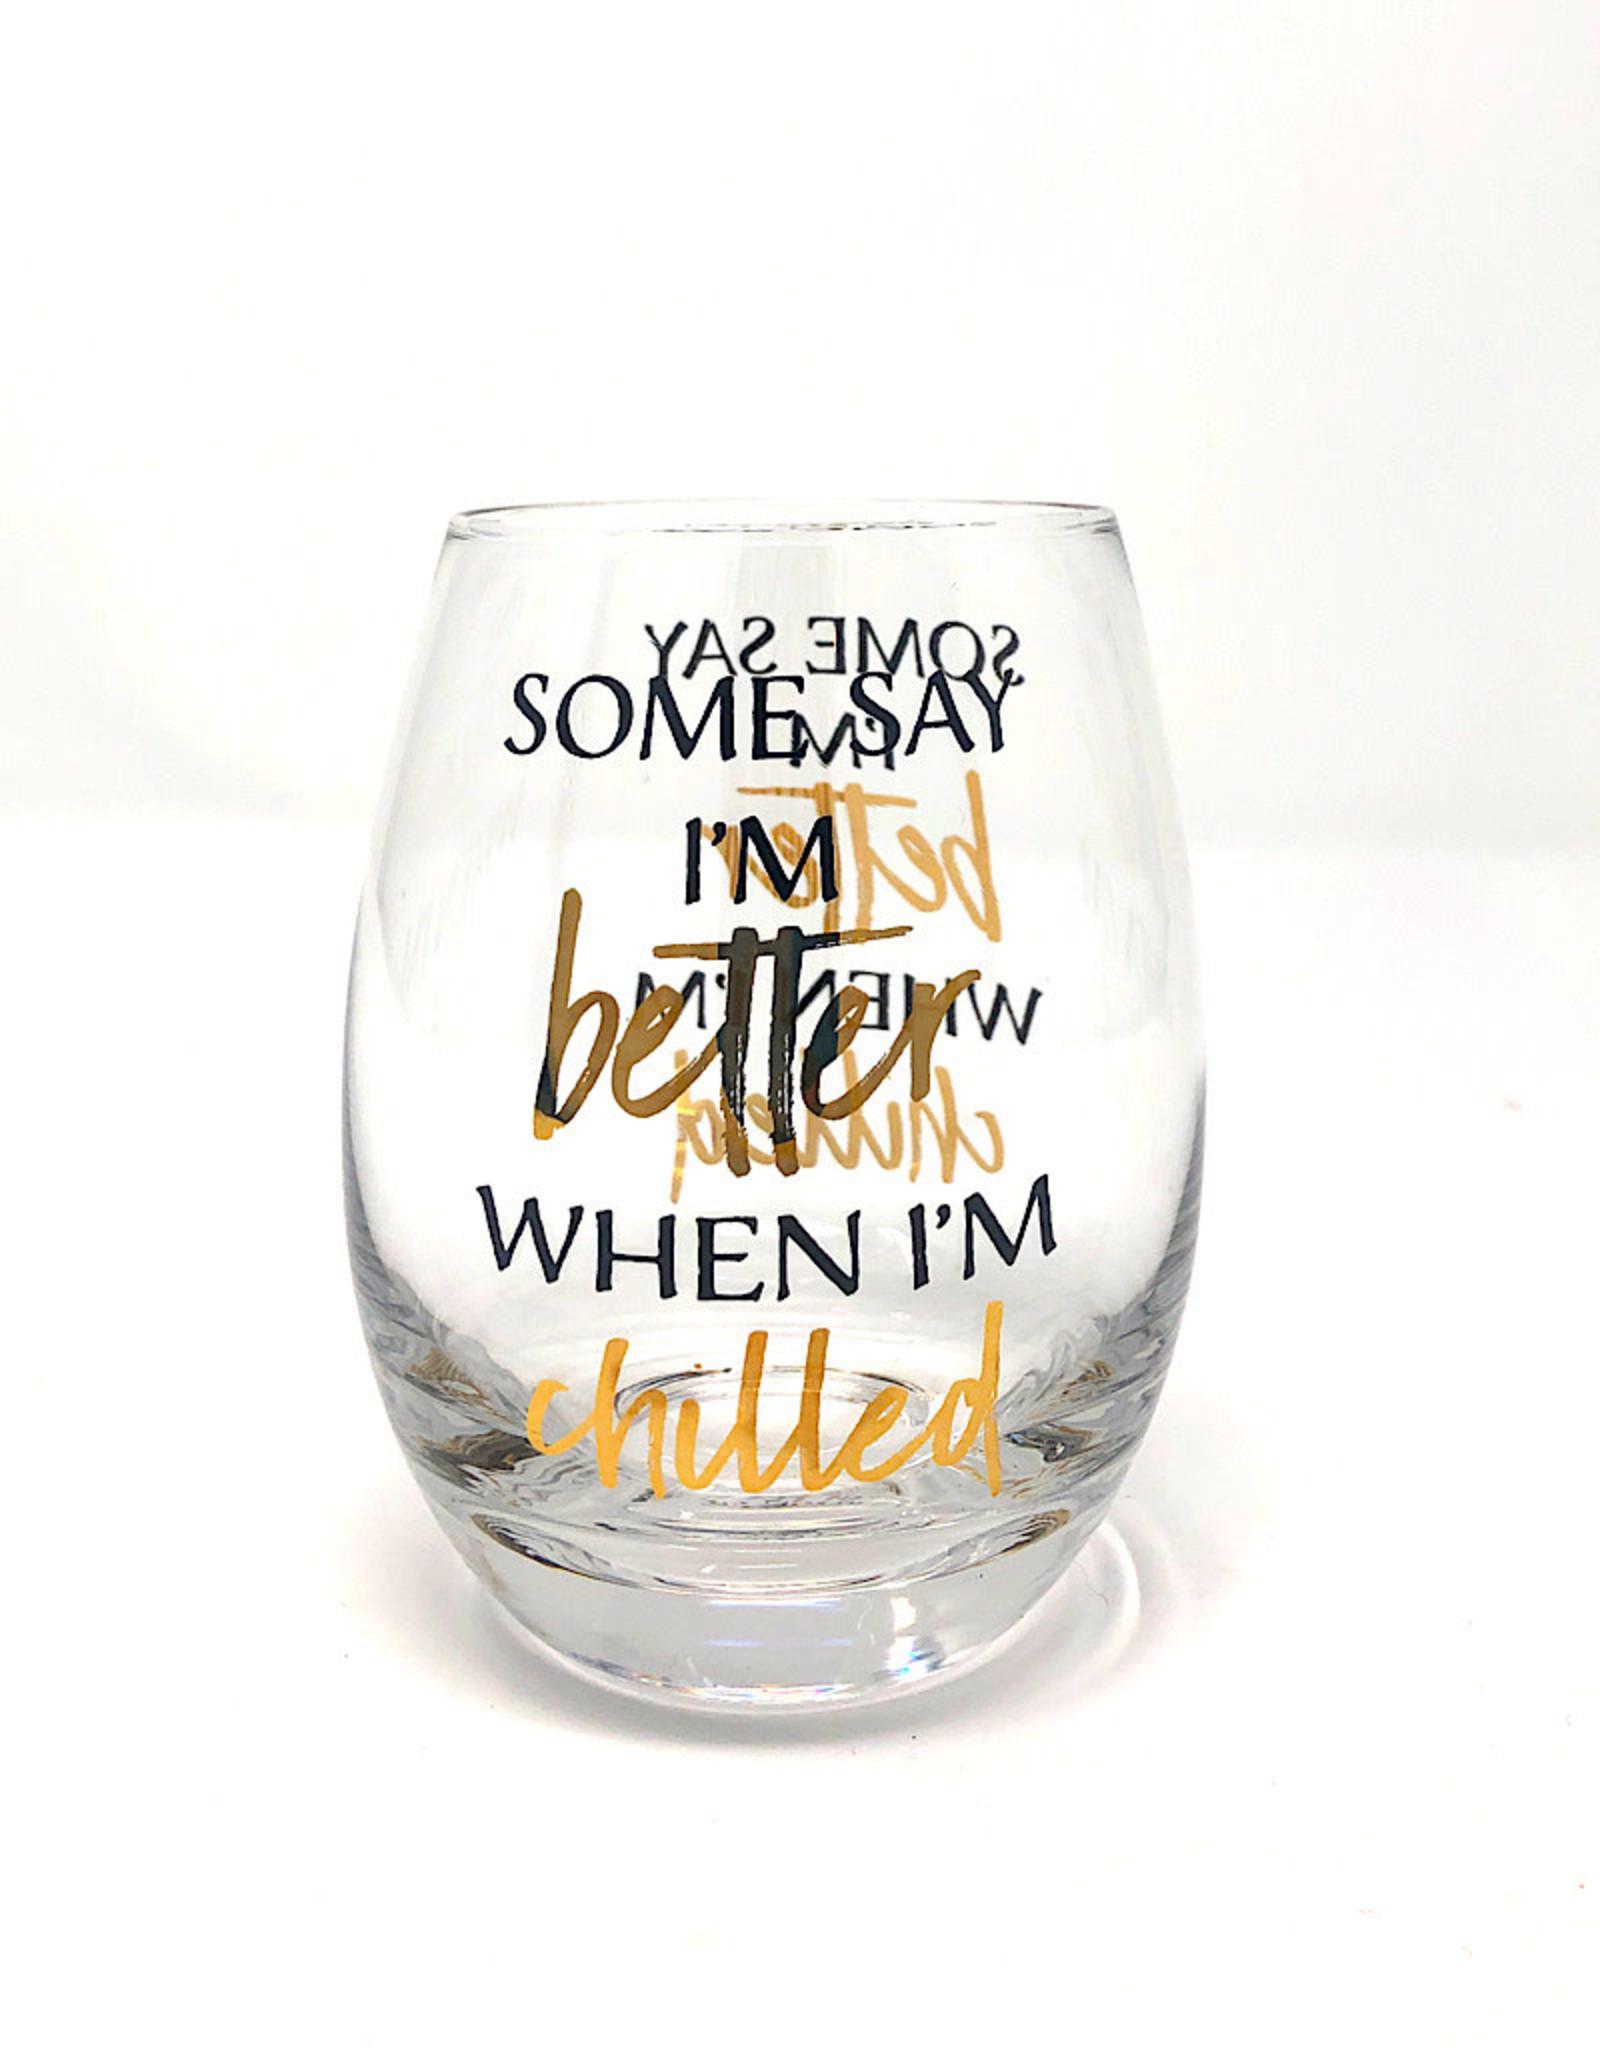 Evergreen Wine Glass Better Chilled